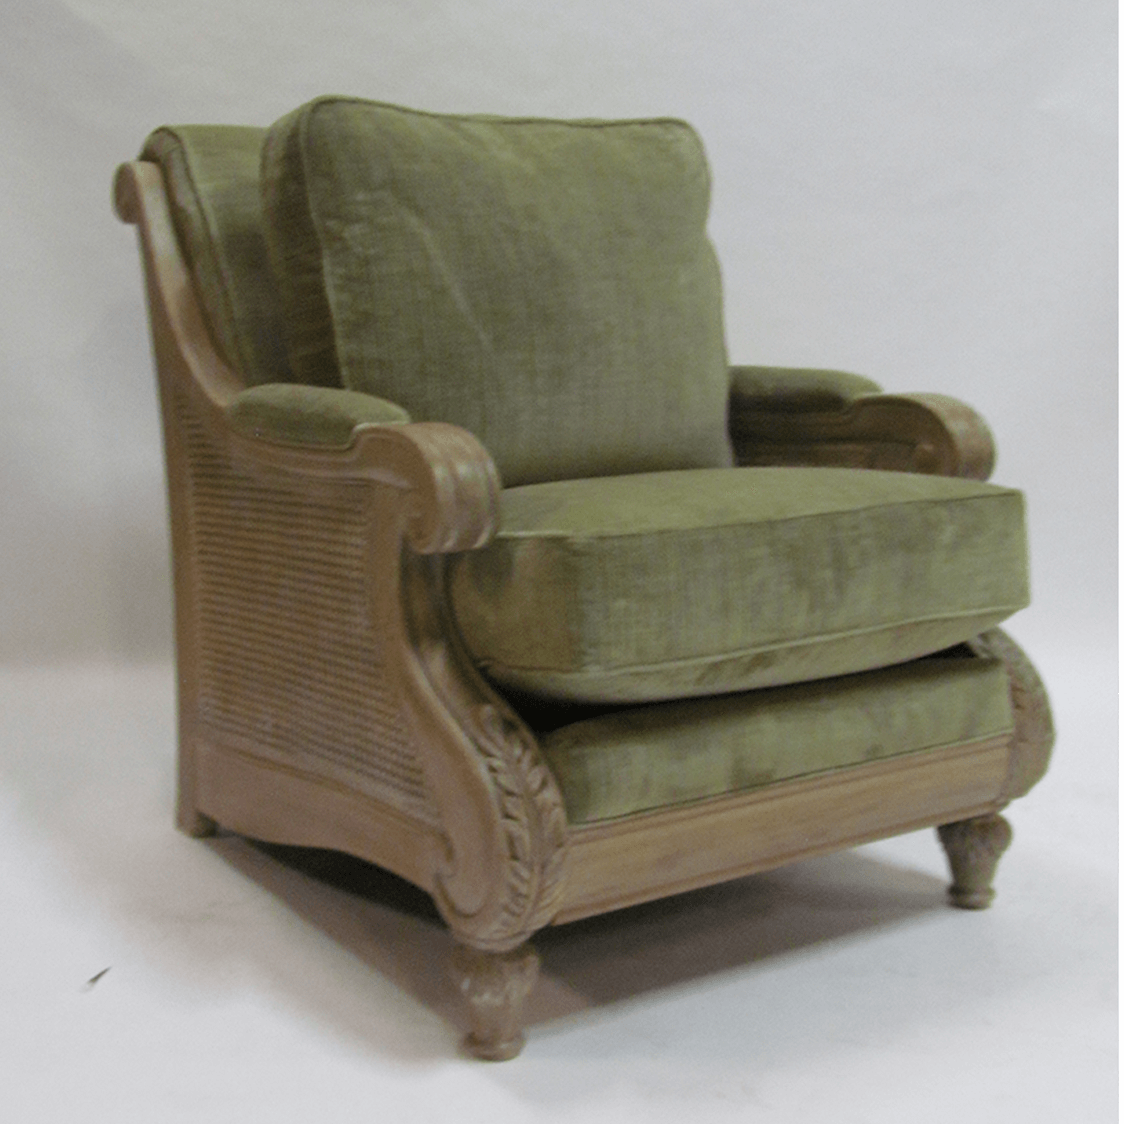 Somerset Plush Lounge Chairs Kdrshowrooms Com